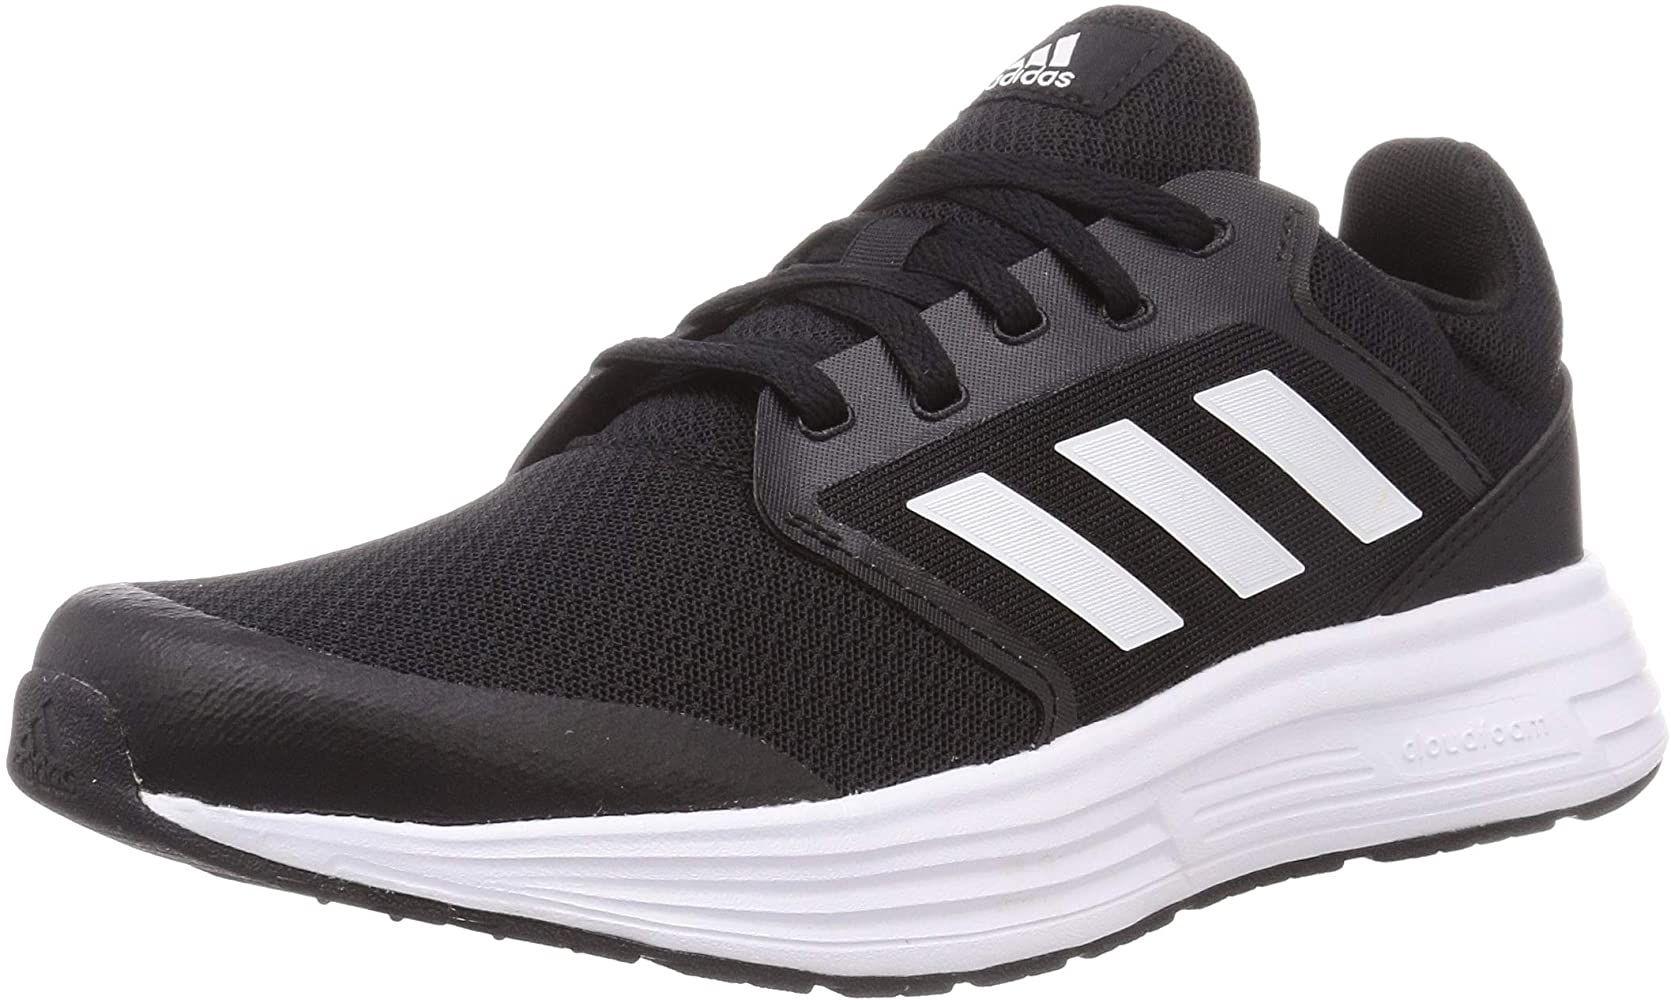 Zapatillas Adidas hombre. Talla 44 2/3